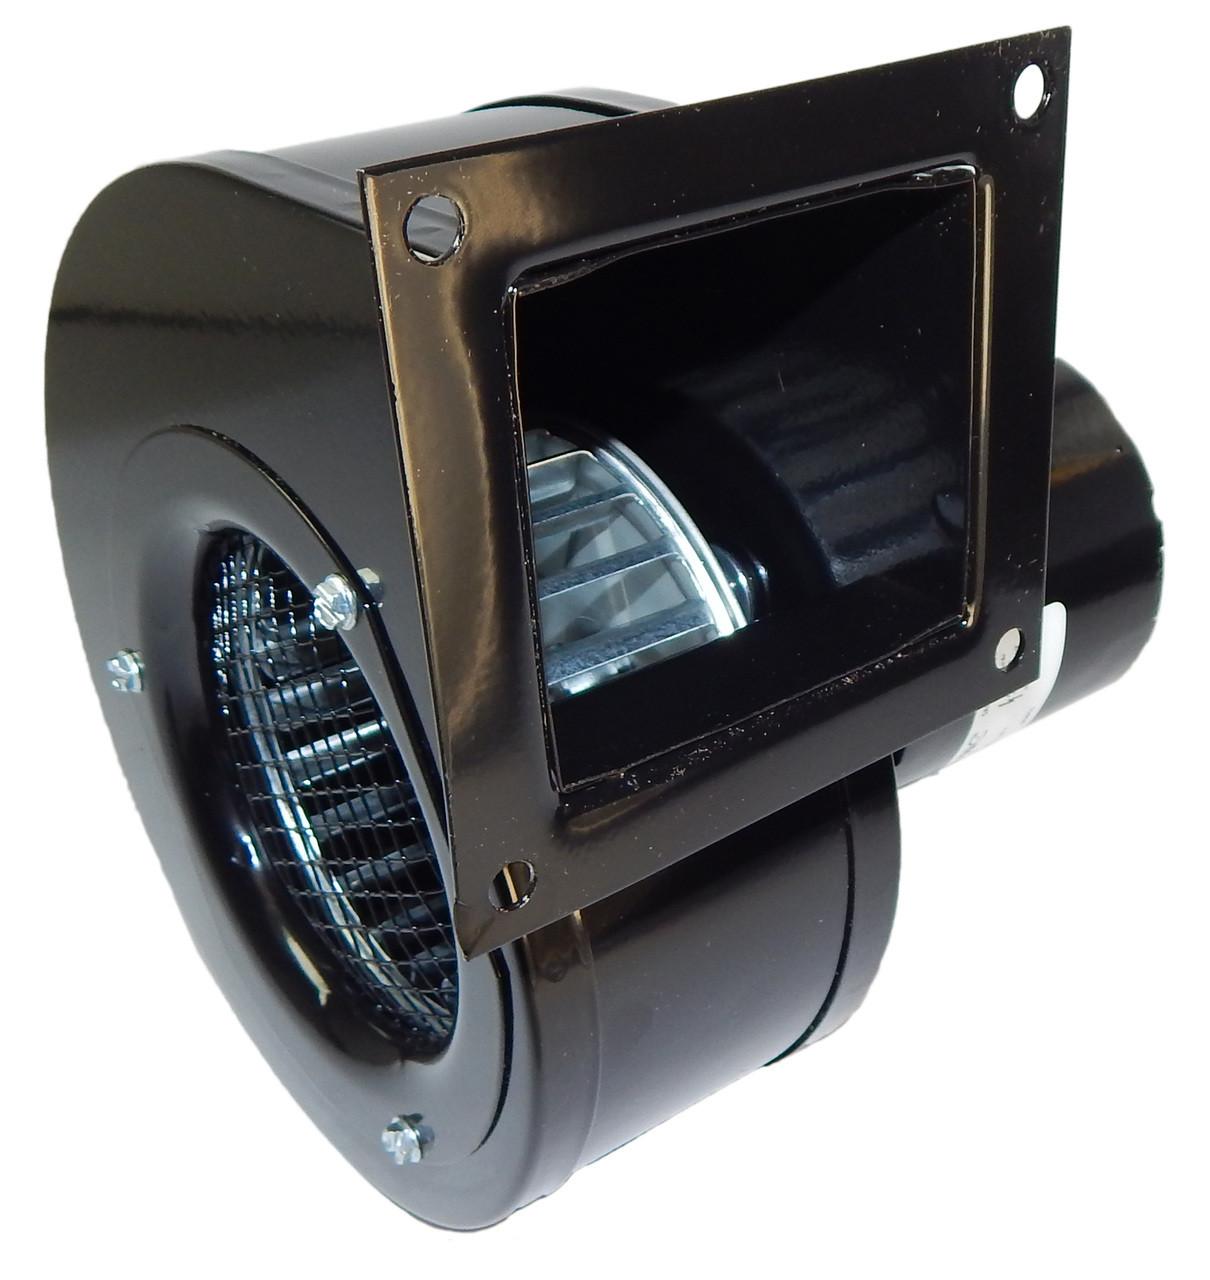 Centrifugal Blower 3200 RPM 115V Fasco # B24220 on